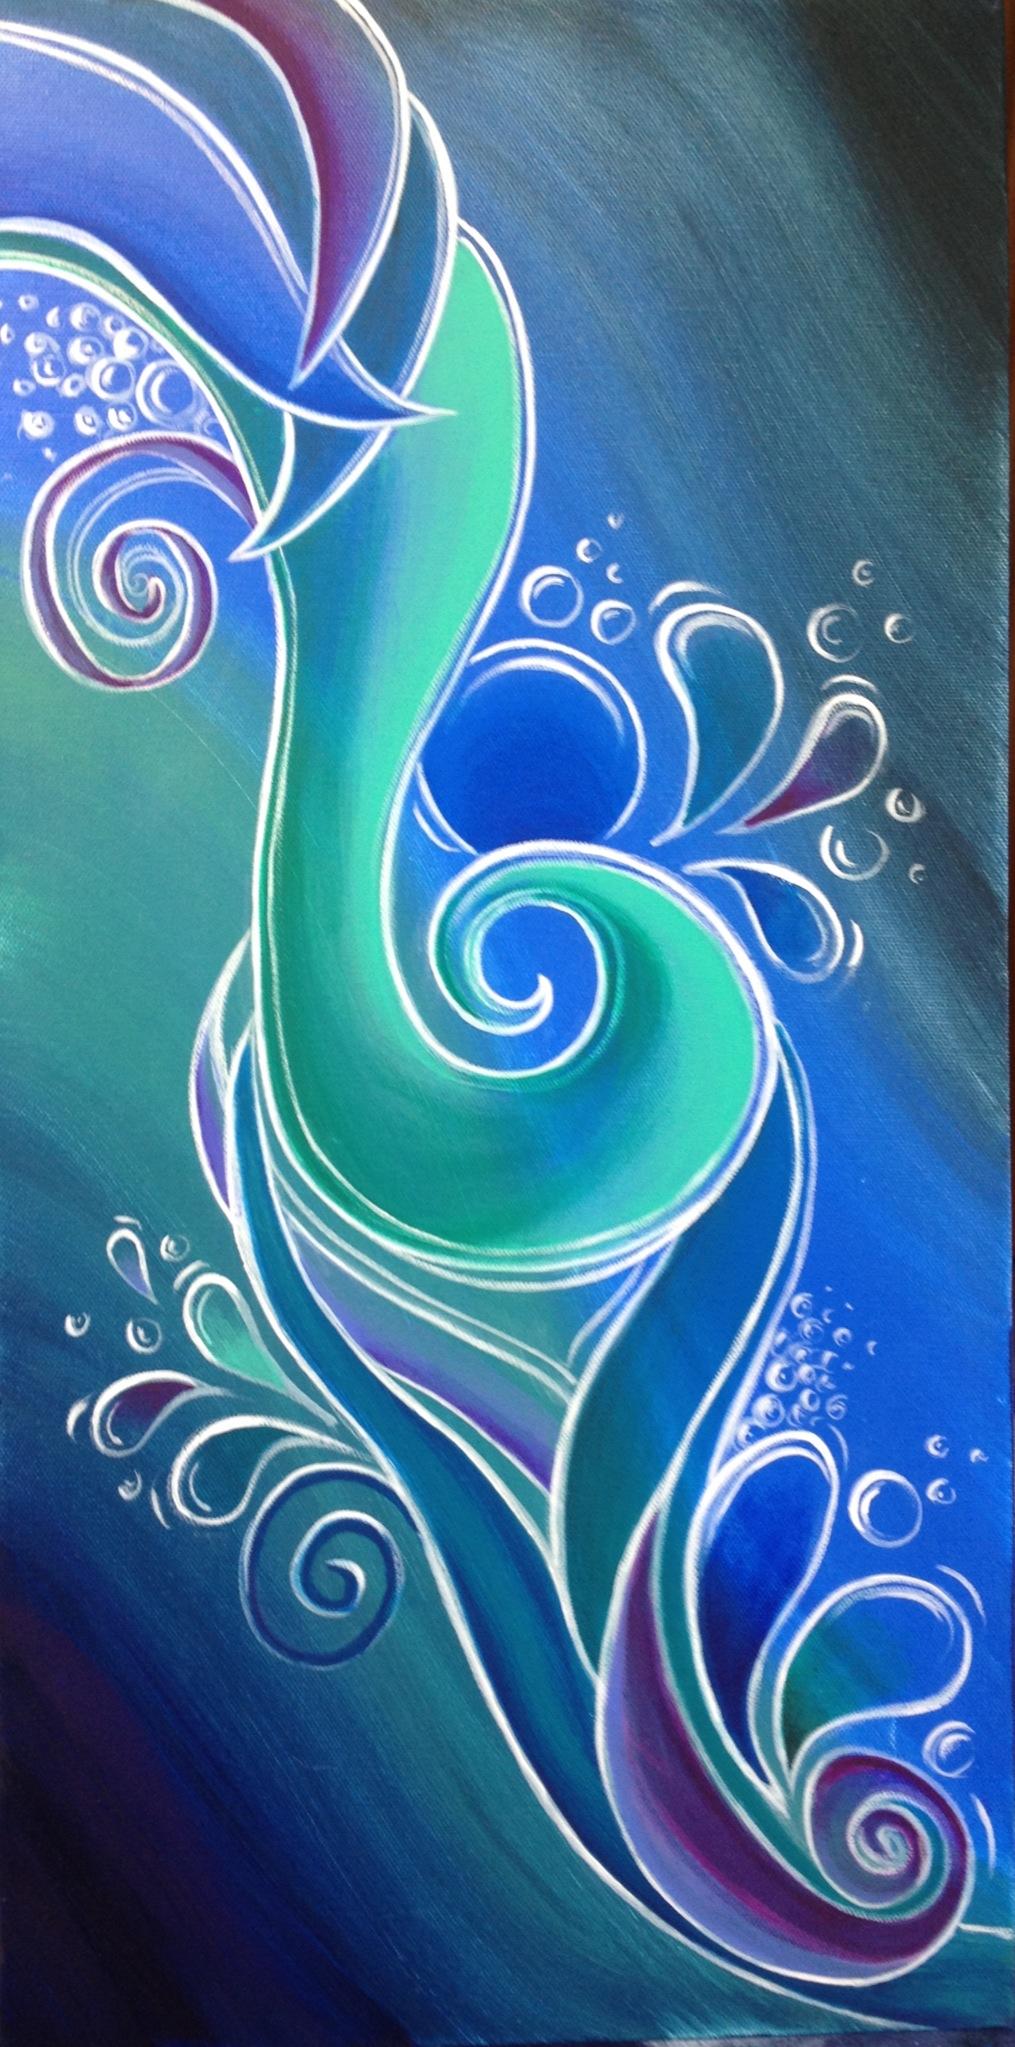 Maori art koru pixshark images galleries with